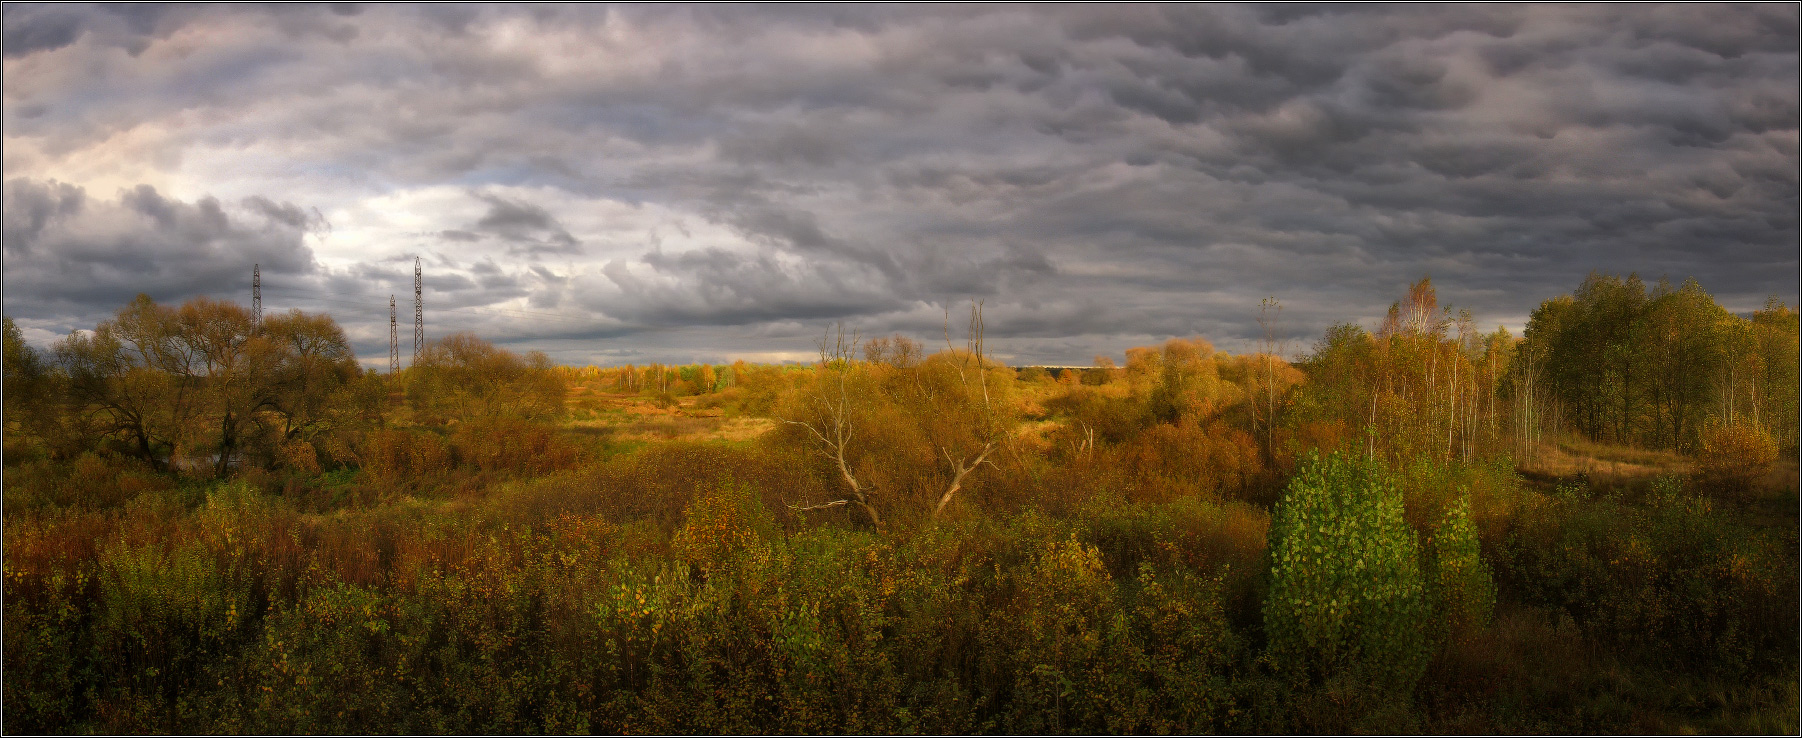 http://i1.imageban.ru/out/2011/10/15/46a9d041c840a4ee97cacf8448509b0b.jpg